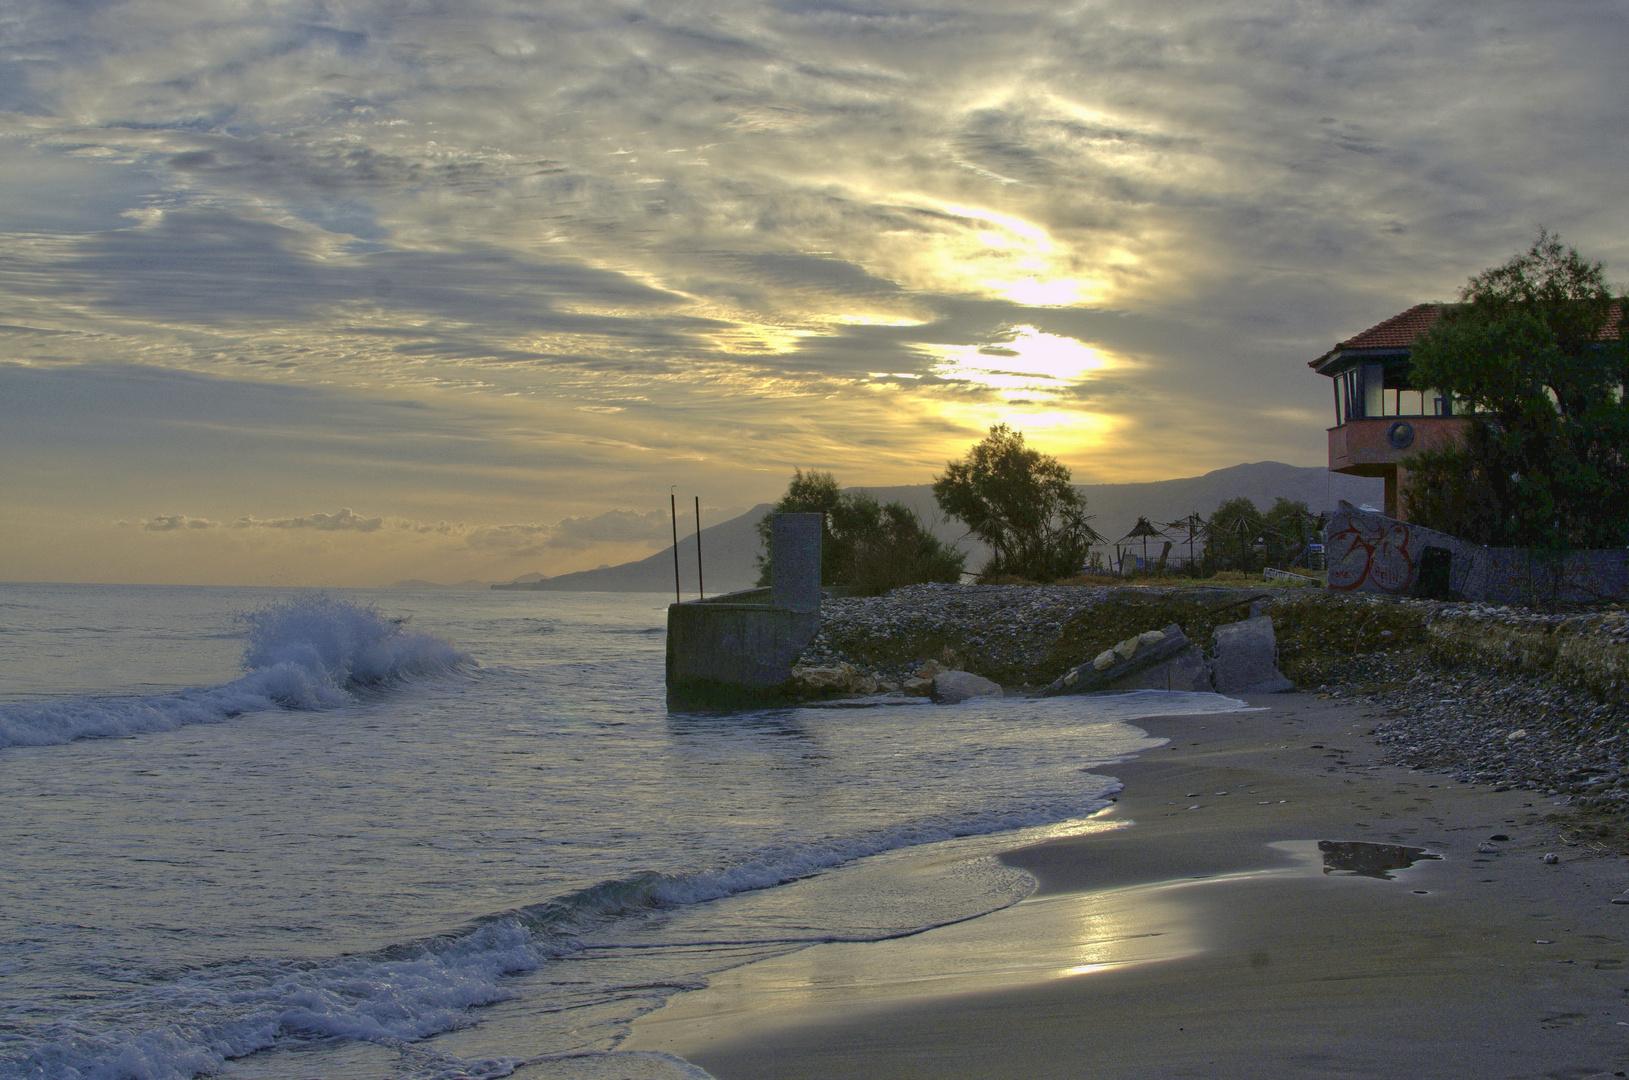 Tagesstart am Meer